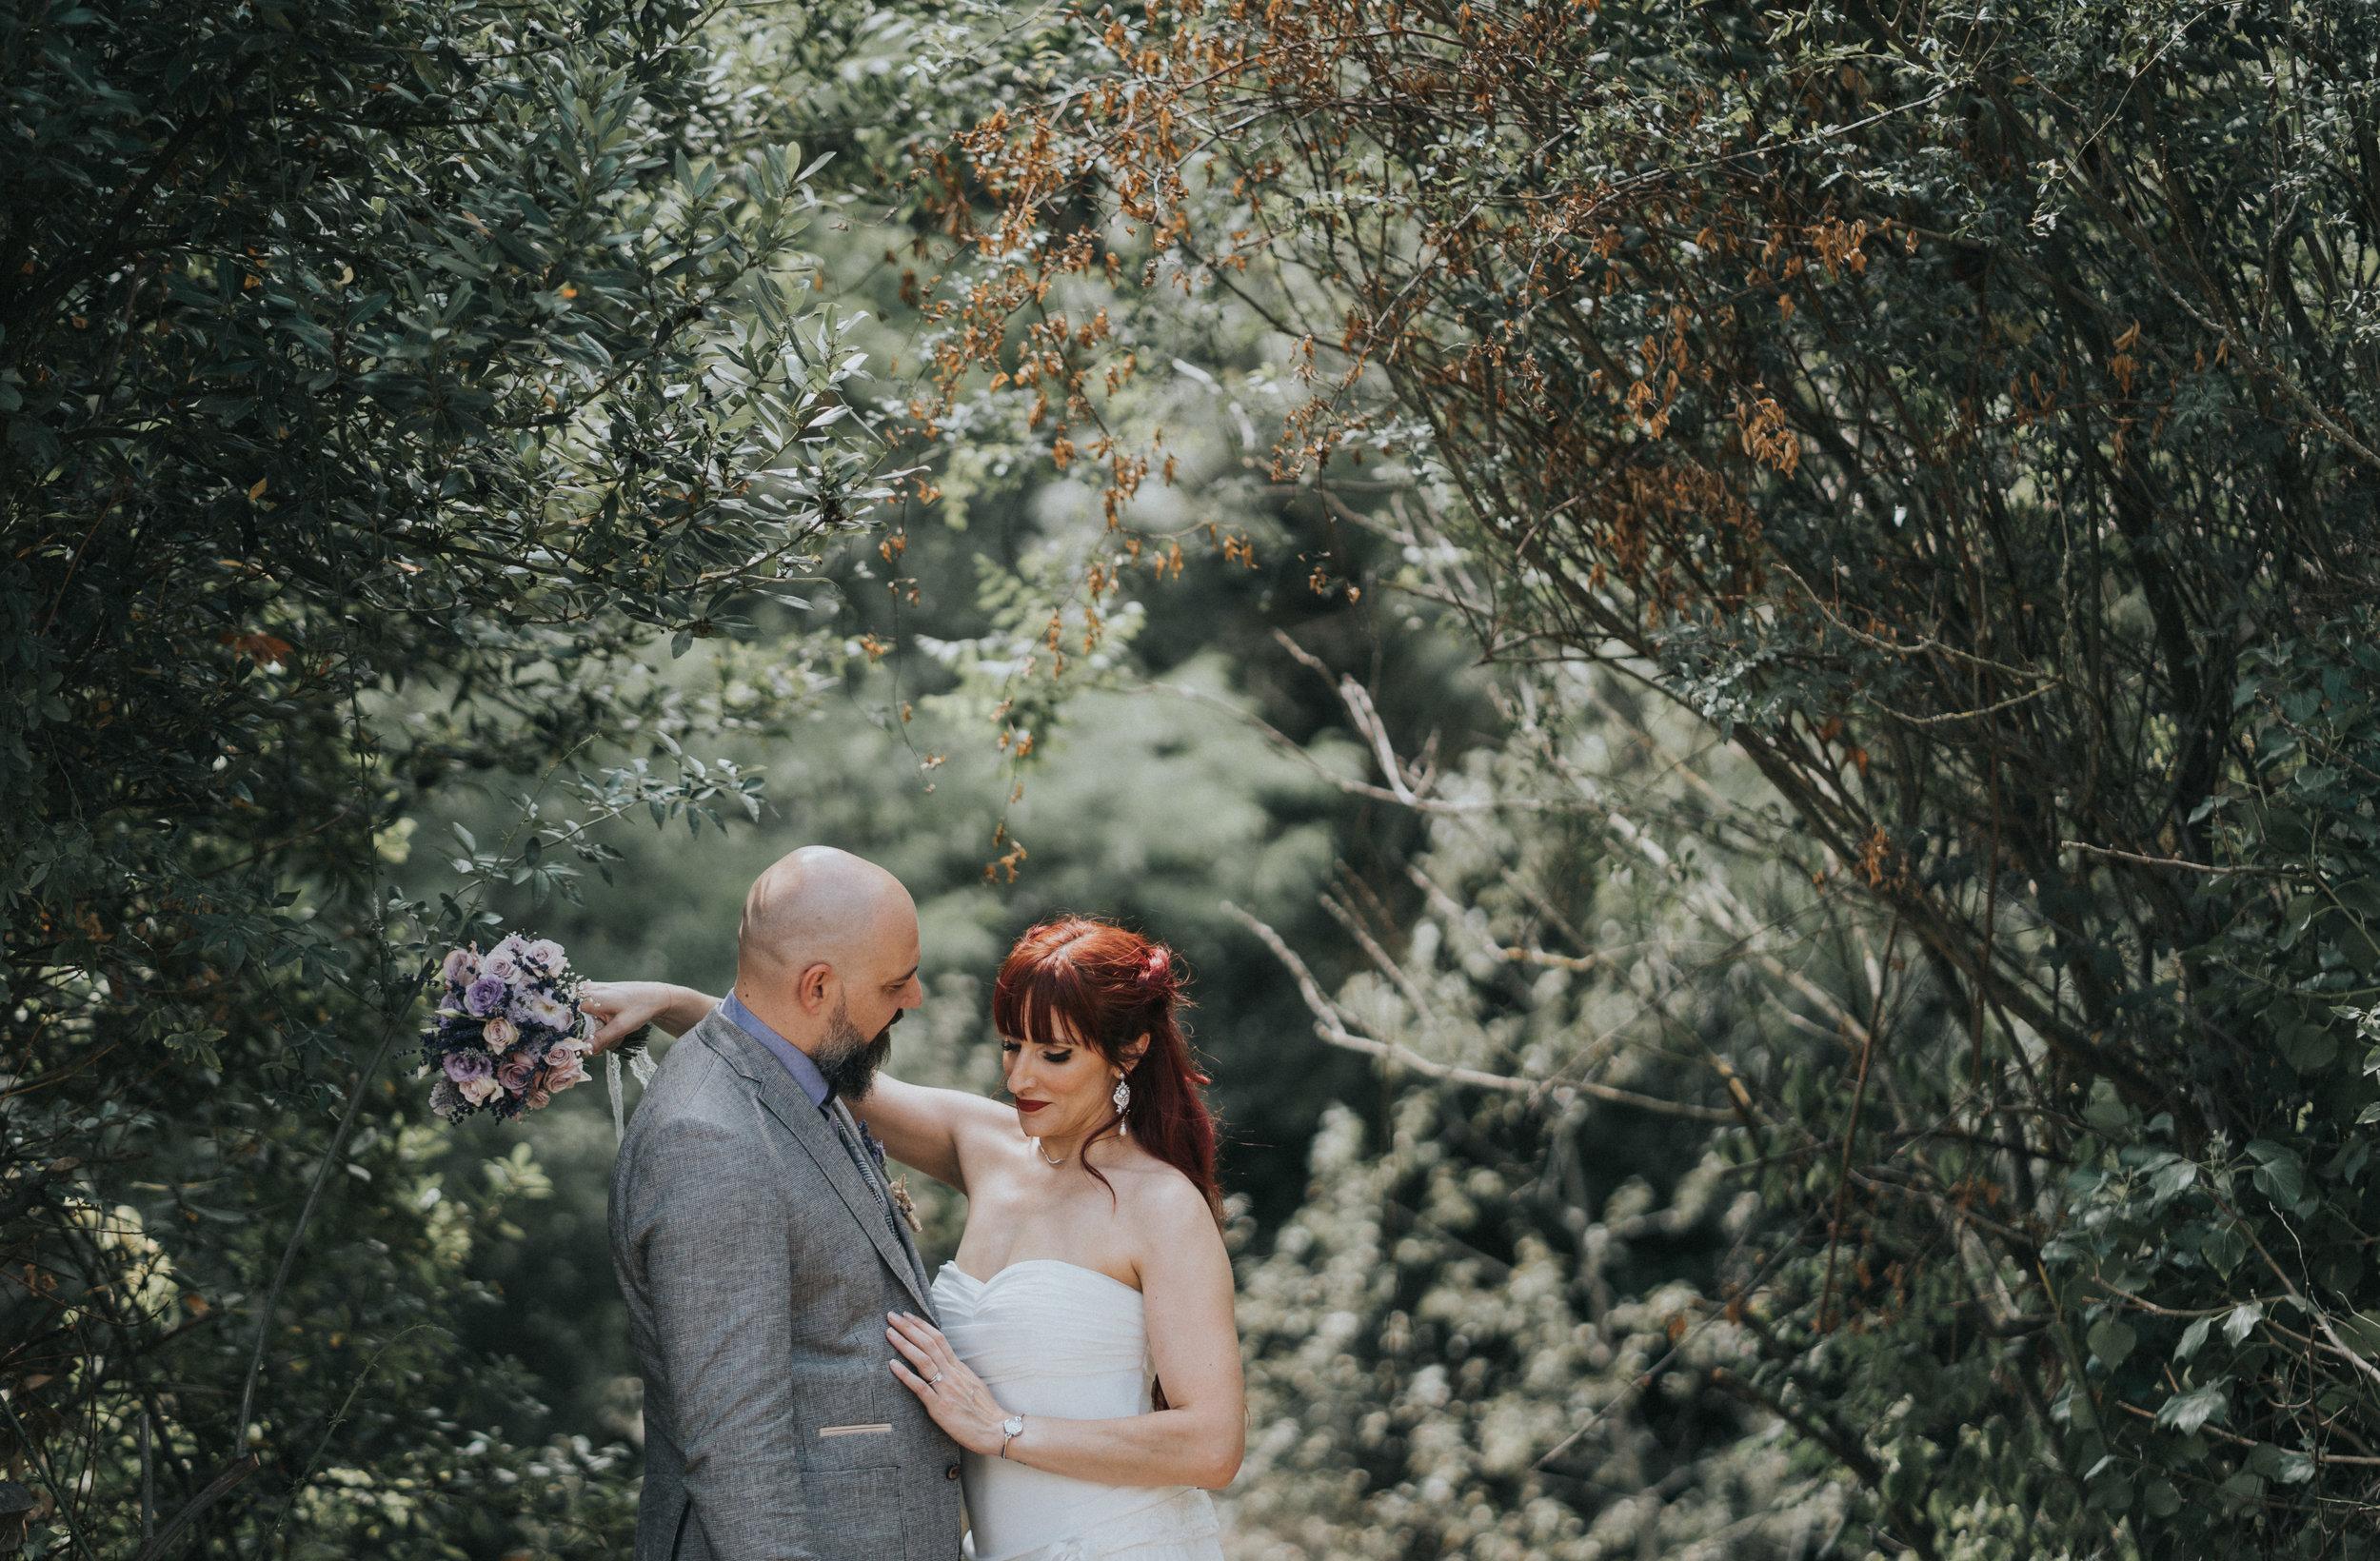 french-farmhouse-wedding-photography-carcassonne-france-41